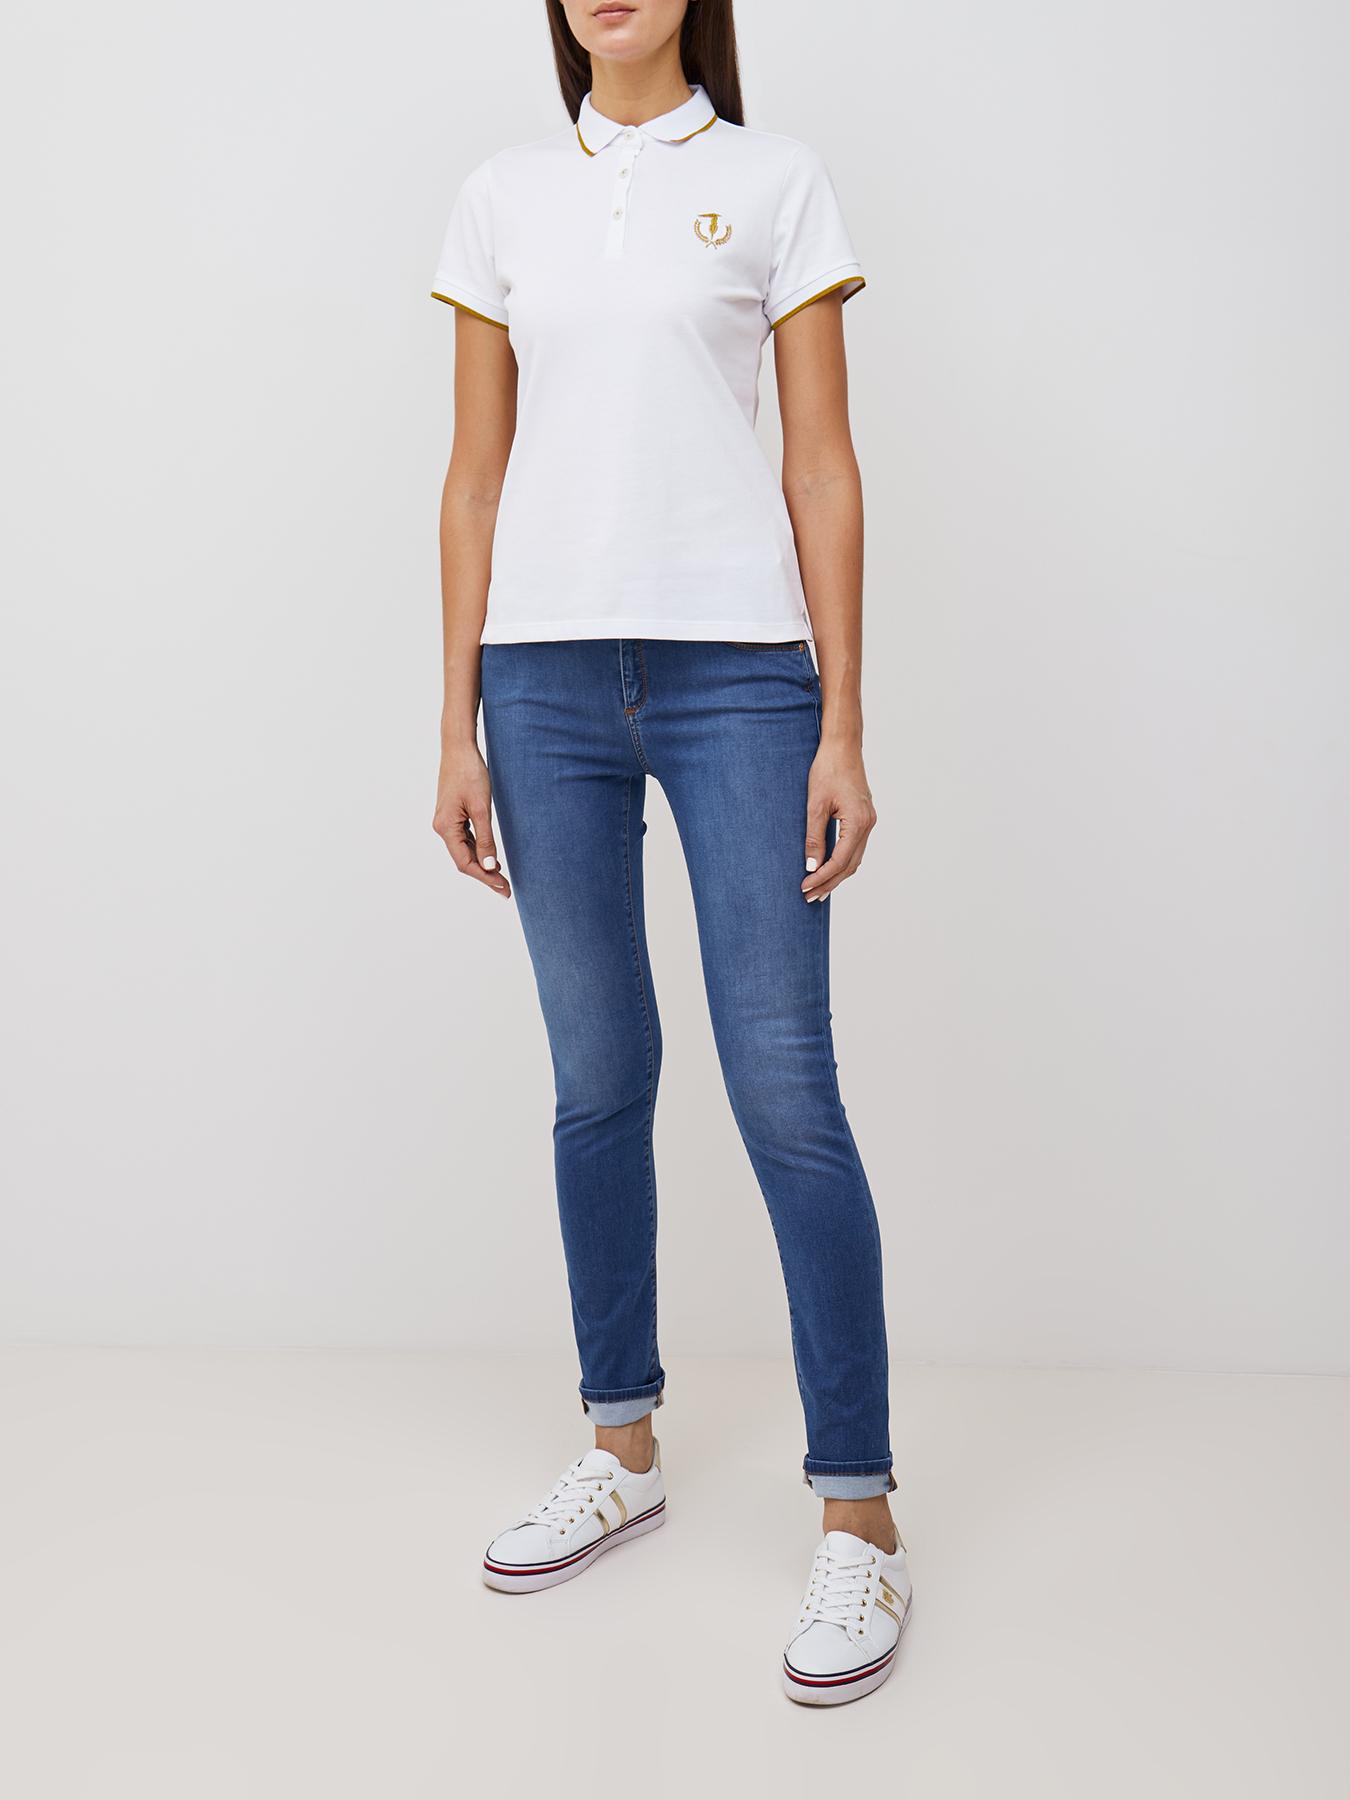 Trussardi Jeans Поло фото